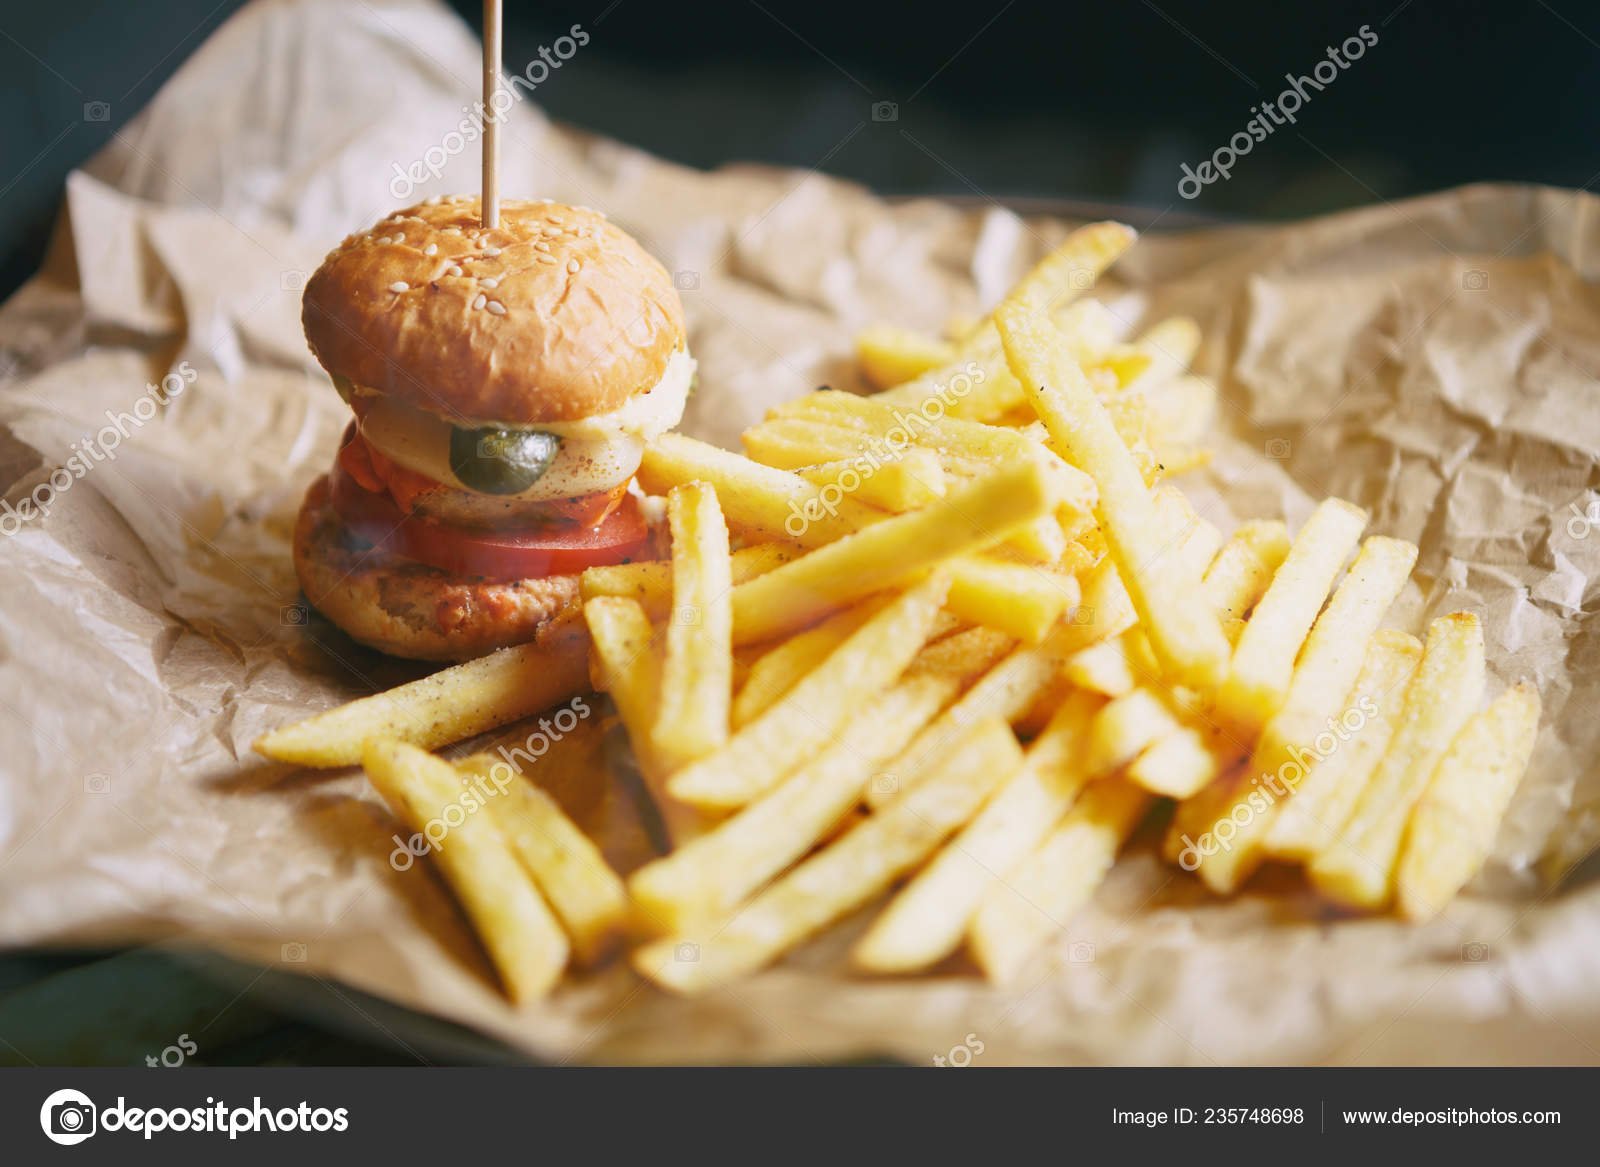 Tasty Little Baby Burger Cafe Menu Fast Food Restaurant Dish Stock Photo C Hurricanehank 235748698